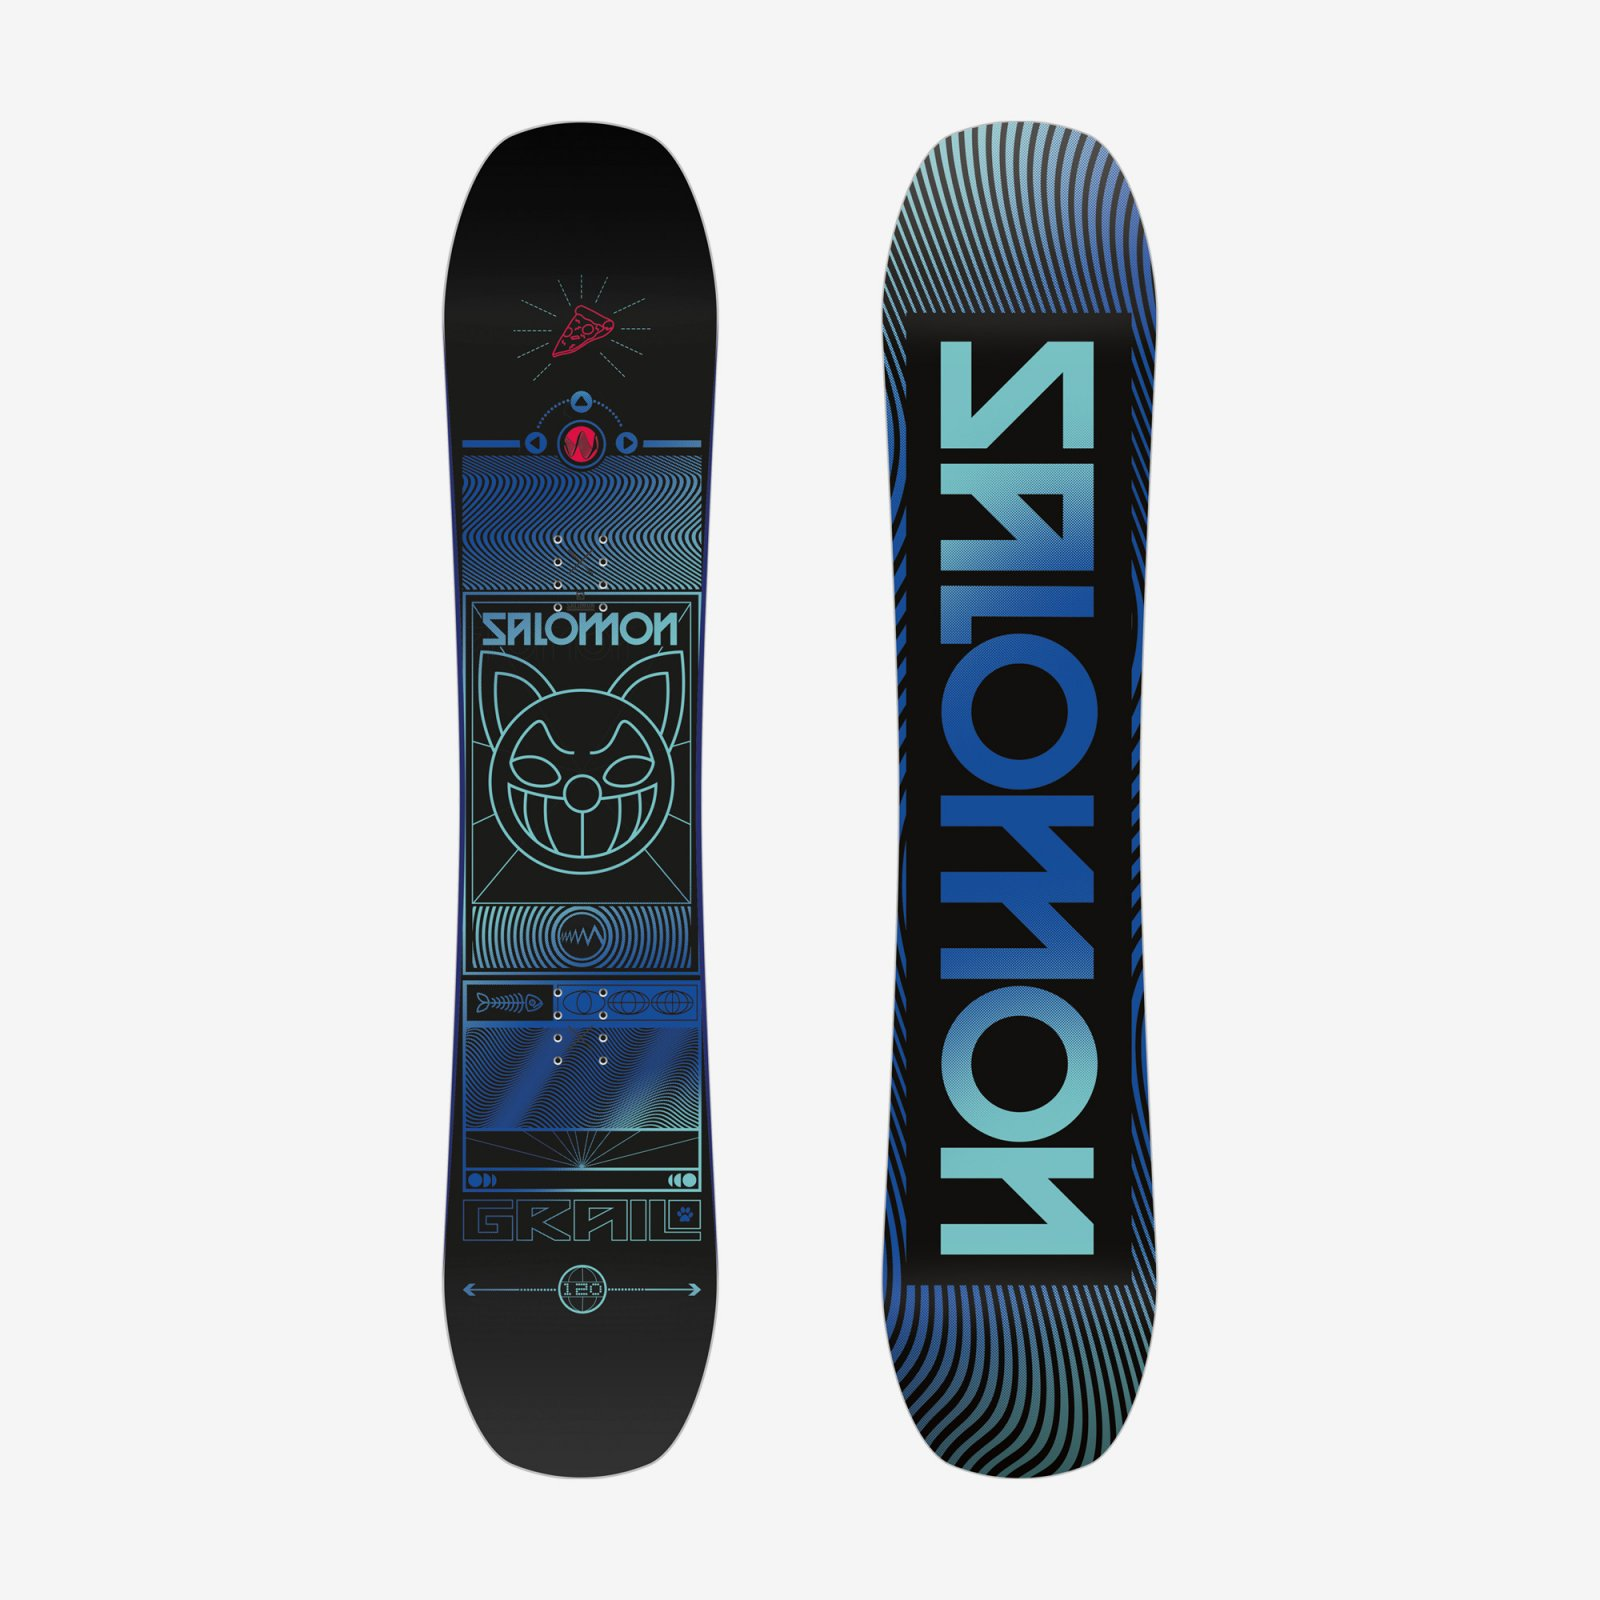 2021 Salomon Grail Junior Snowboard